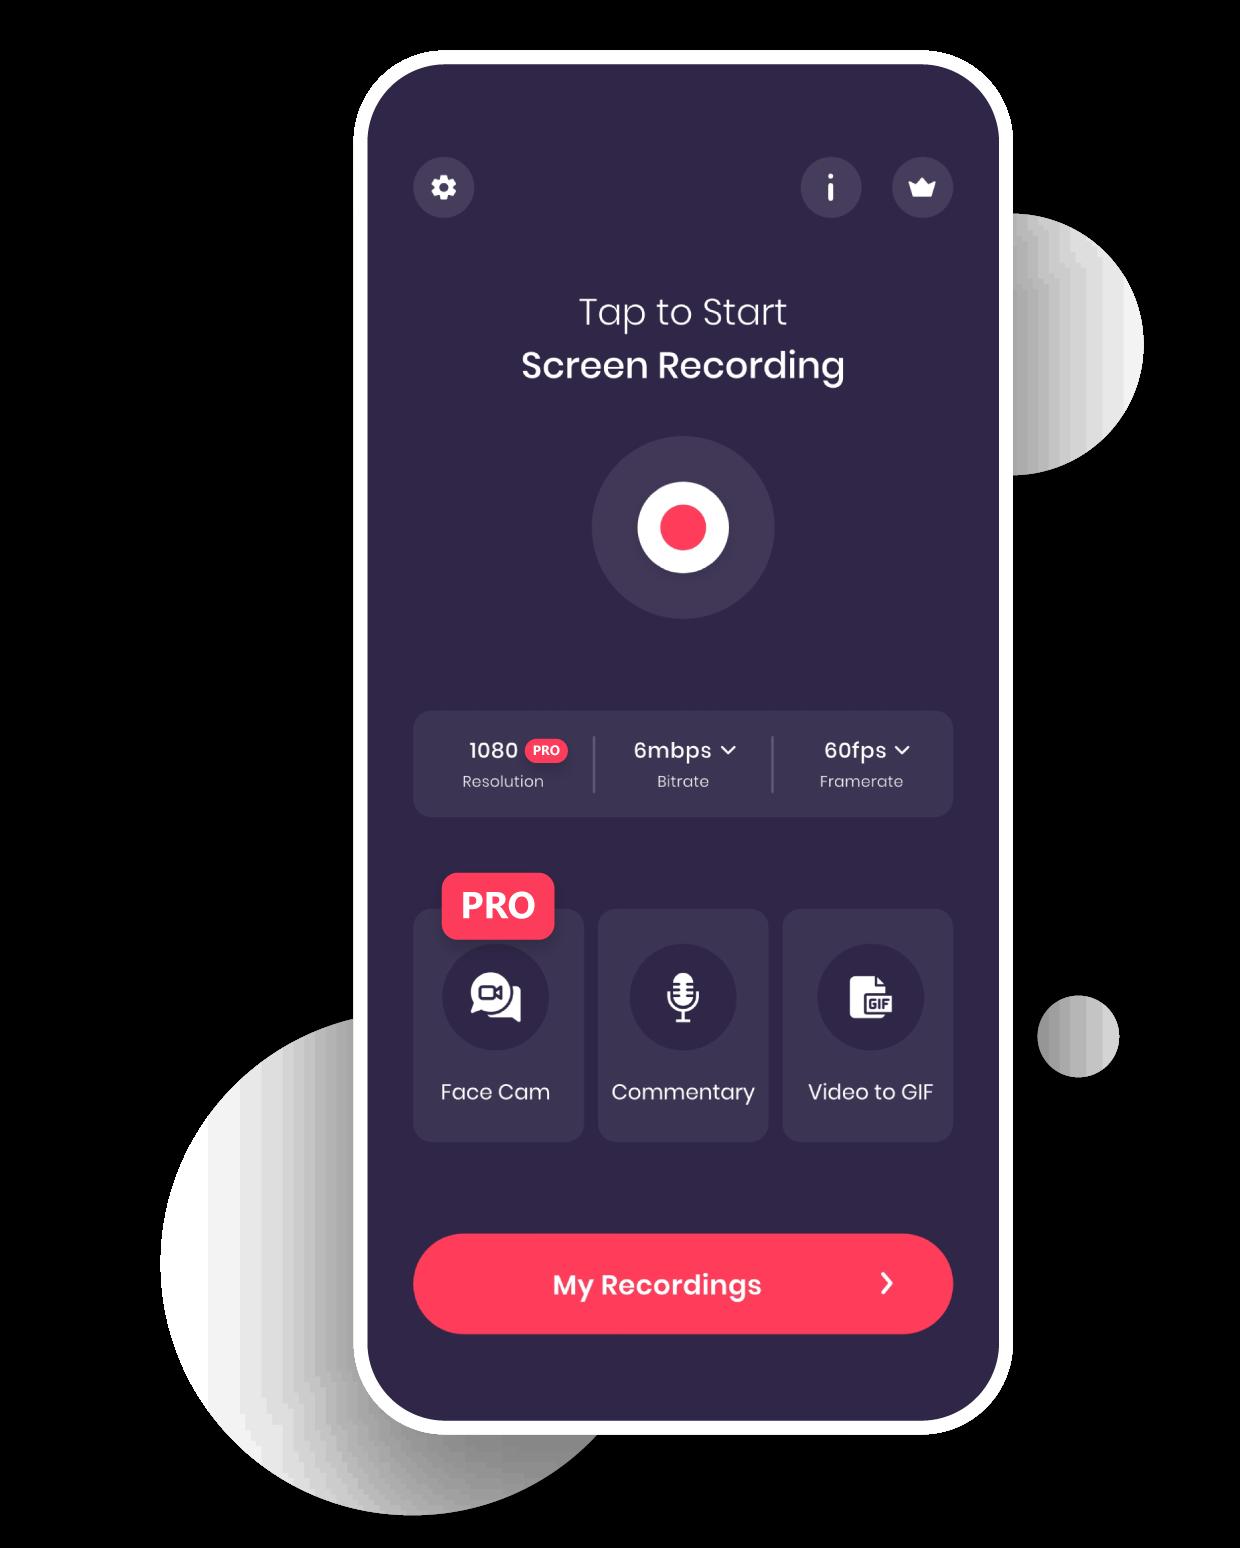 Premium Features of Screen Recorder app for iPhone